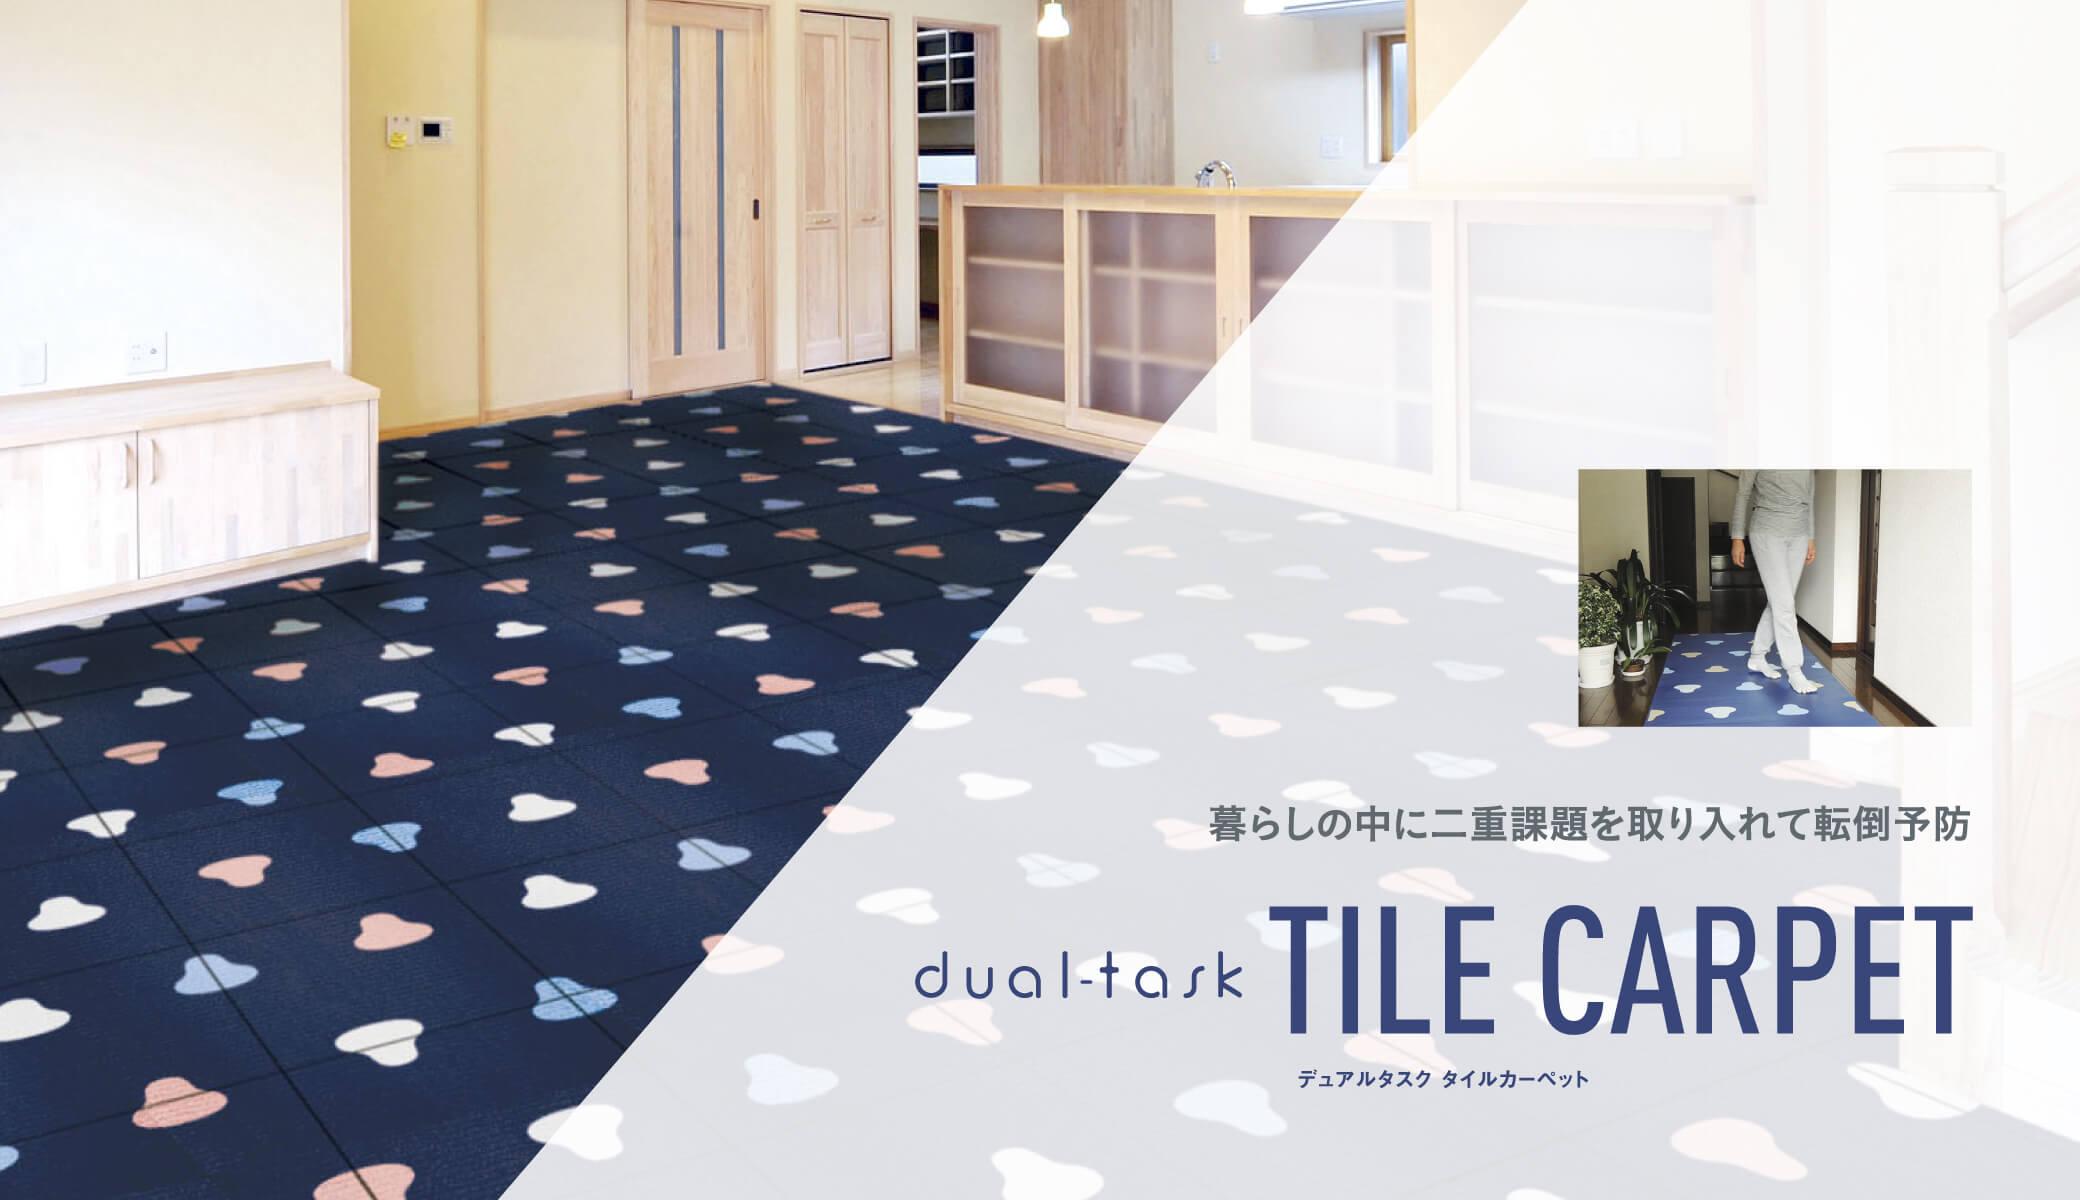 dual-task|デュアルタスク タイルカーペット